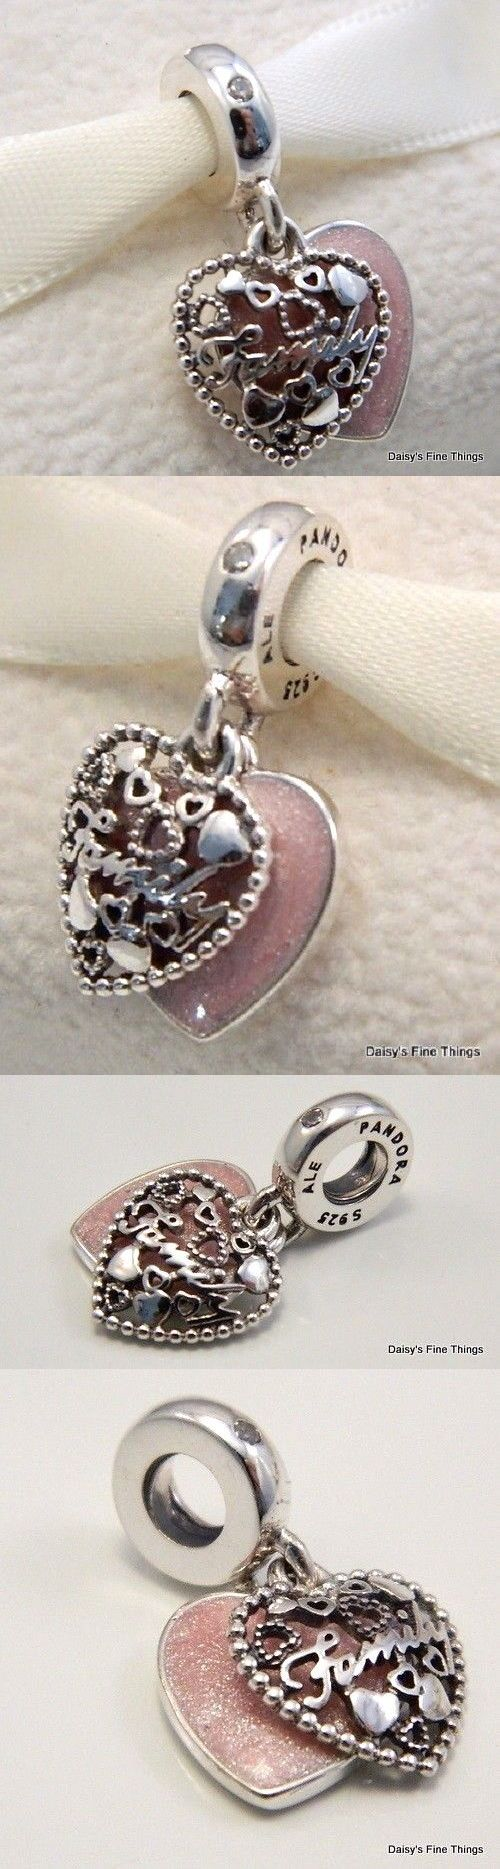 1e08d39a9 ... usa charms and charm bracelets 140944 new authentic pandora charm love  makes a family dangle be64c